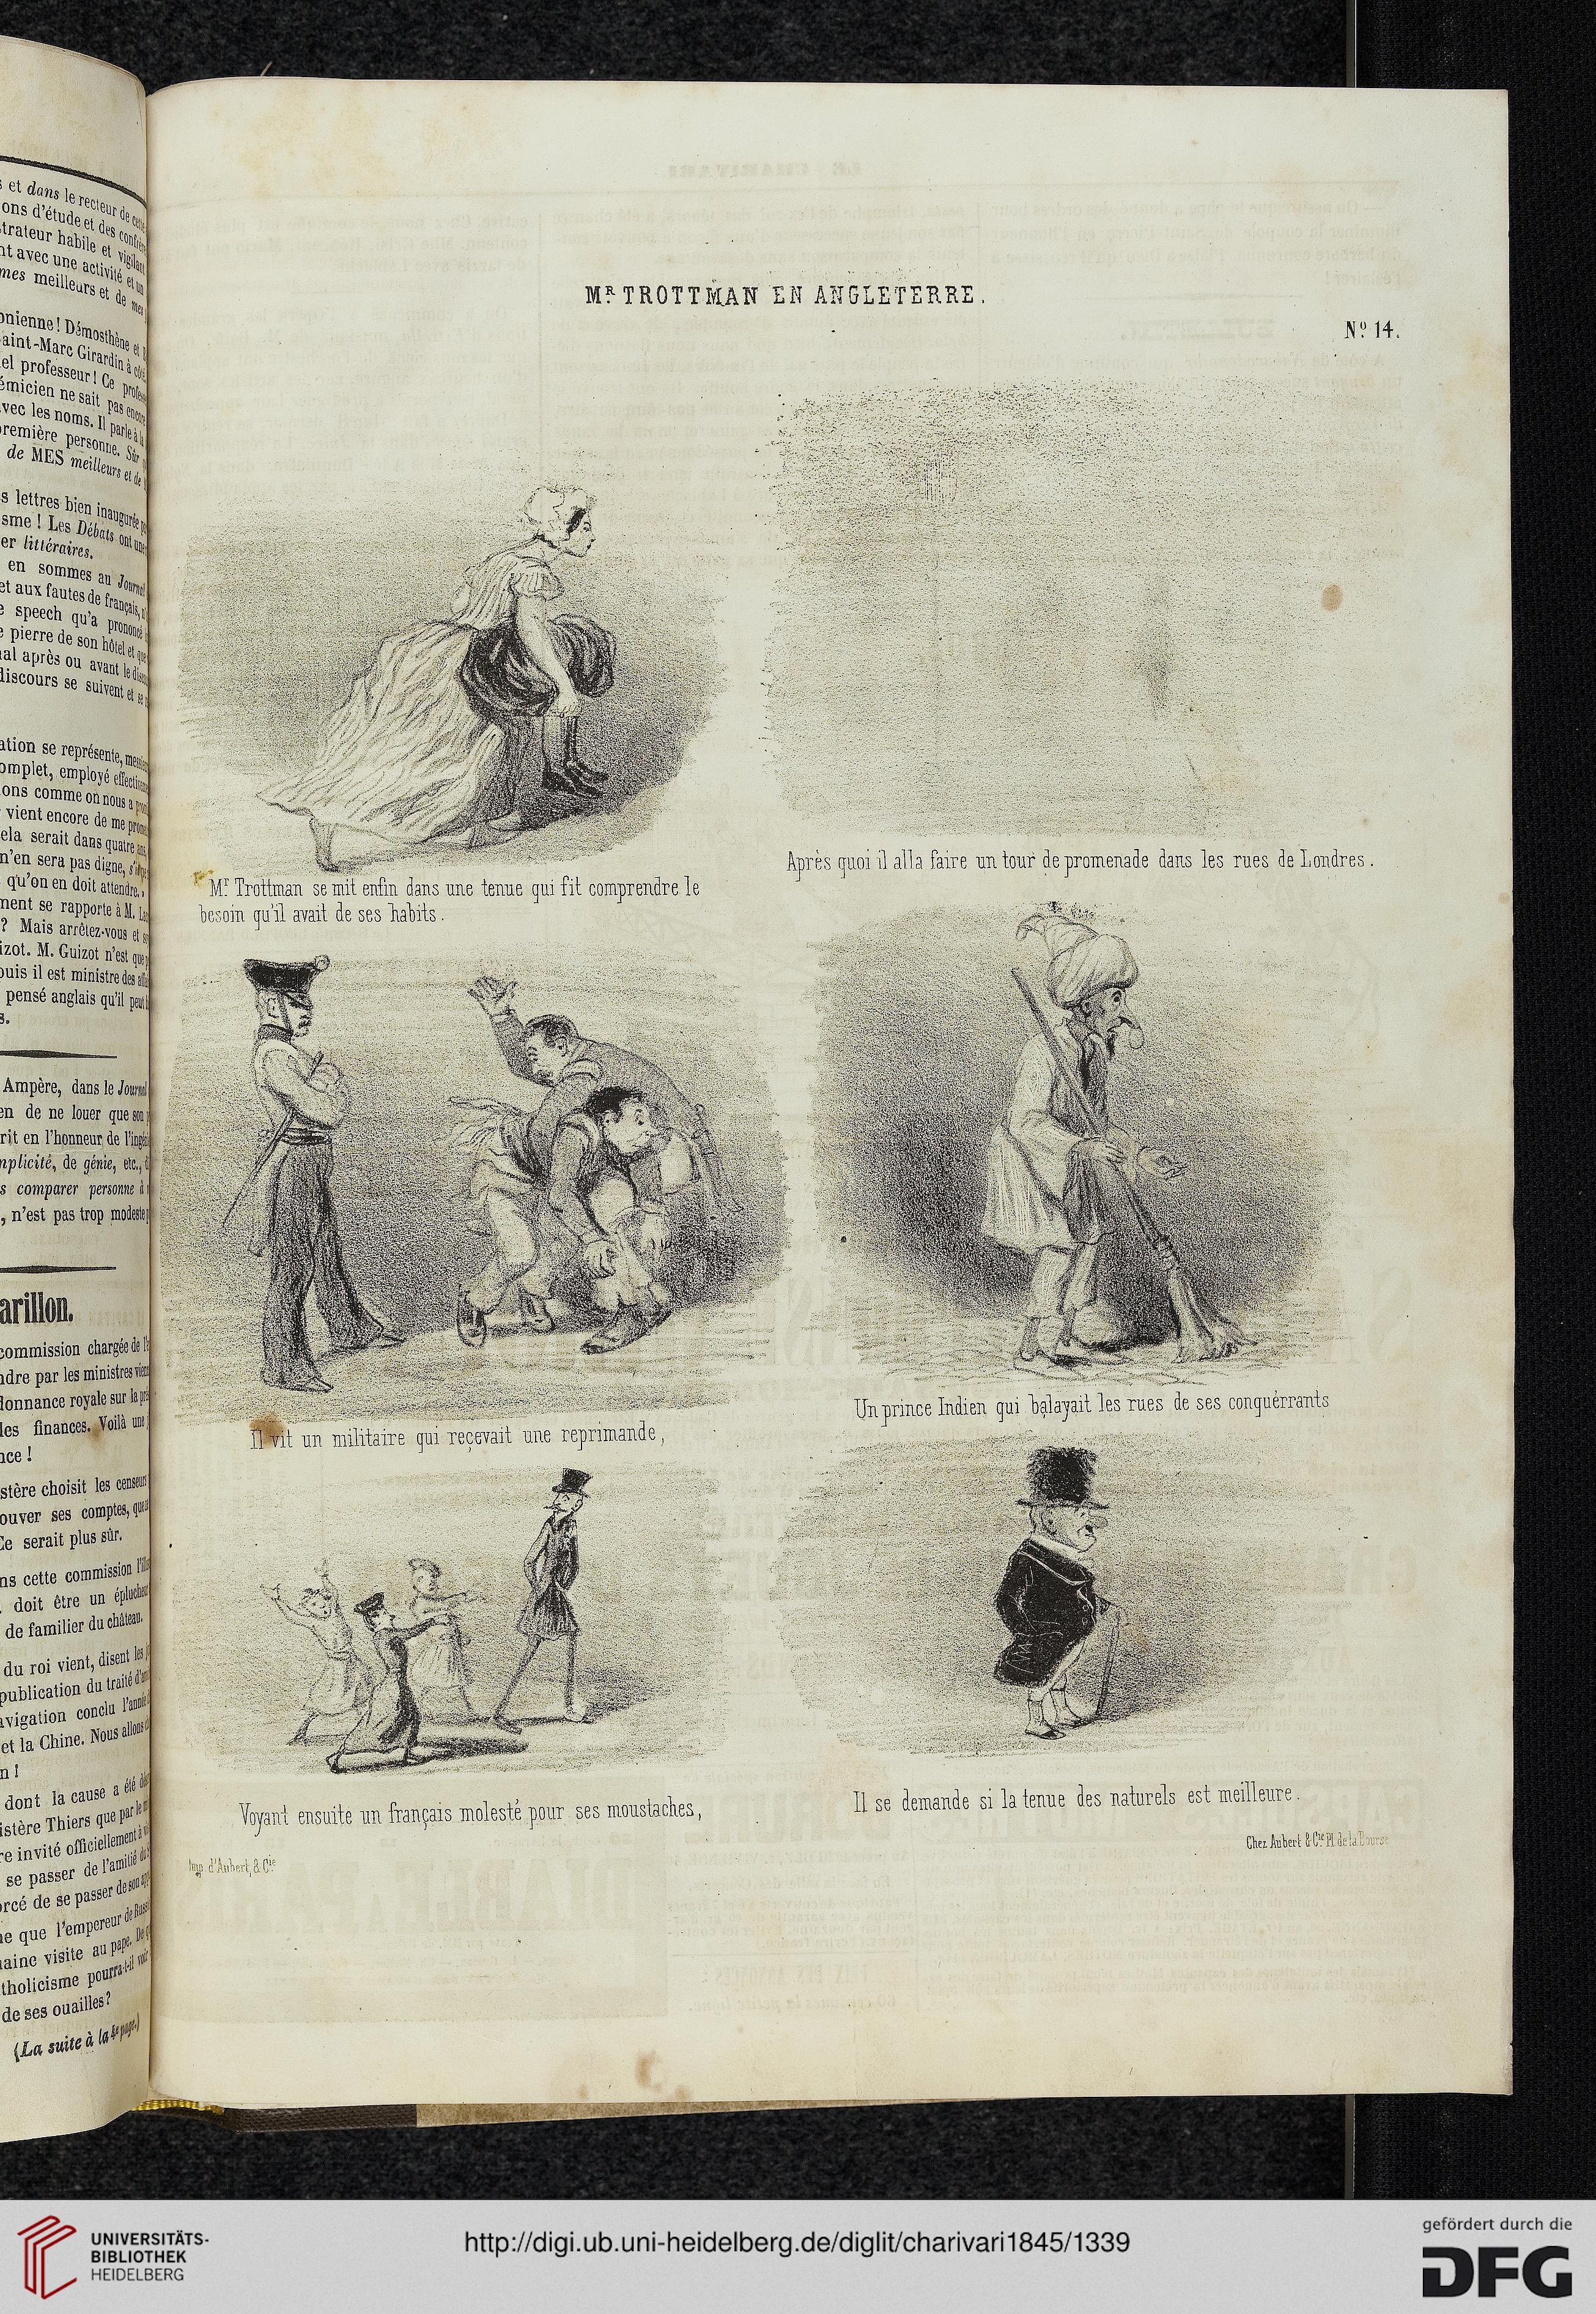 Le charivari (14.1845)